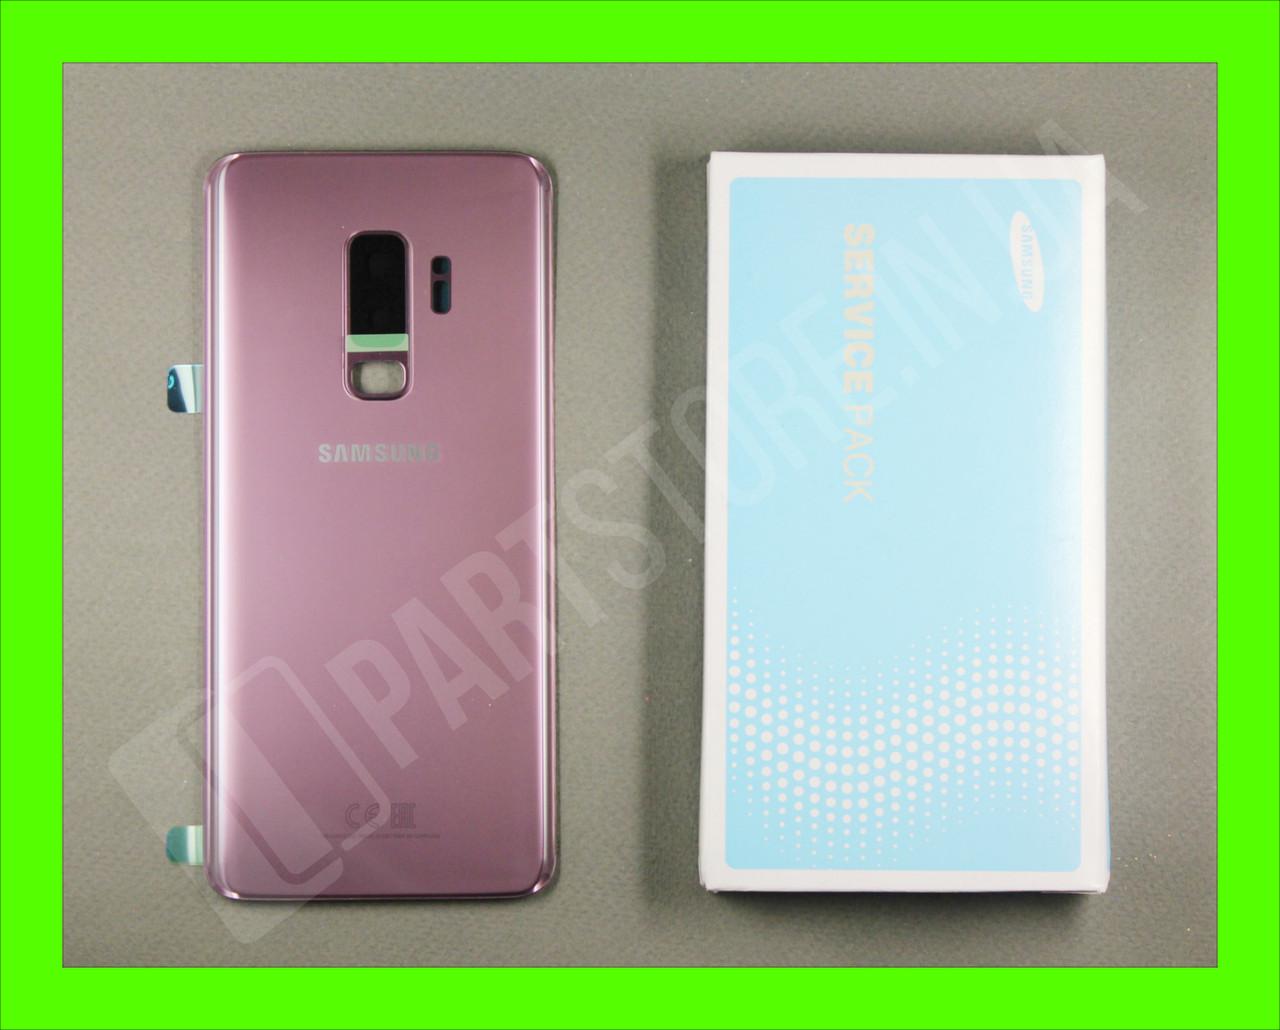 Cервисная оригинальная задняя Крышка Samsung G965 Purple S9 Plus (GH82-15724B)